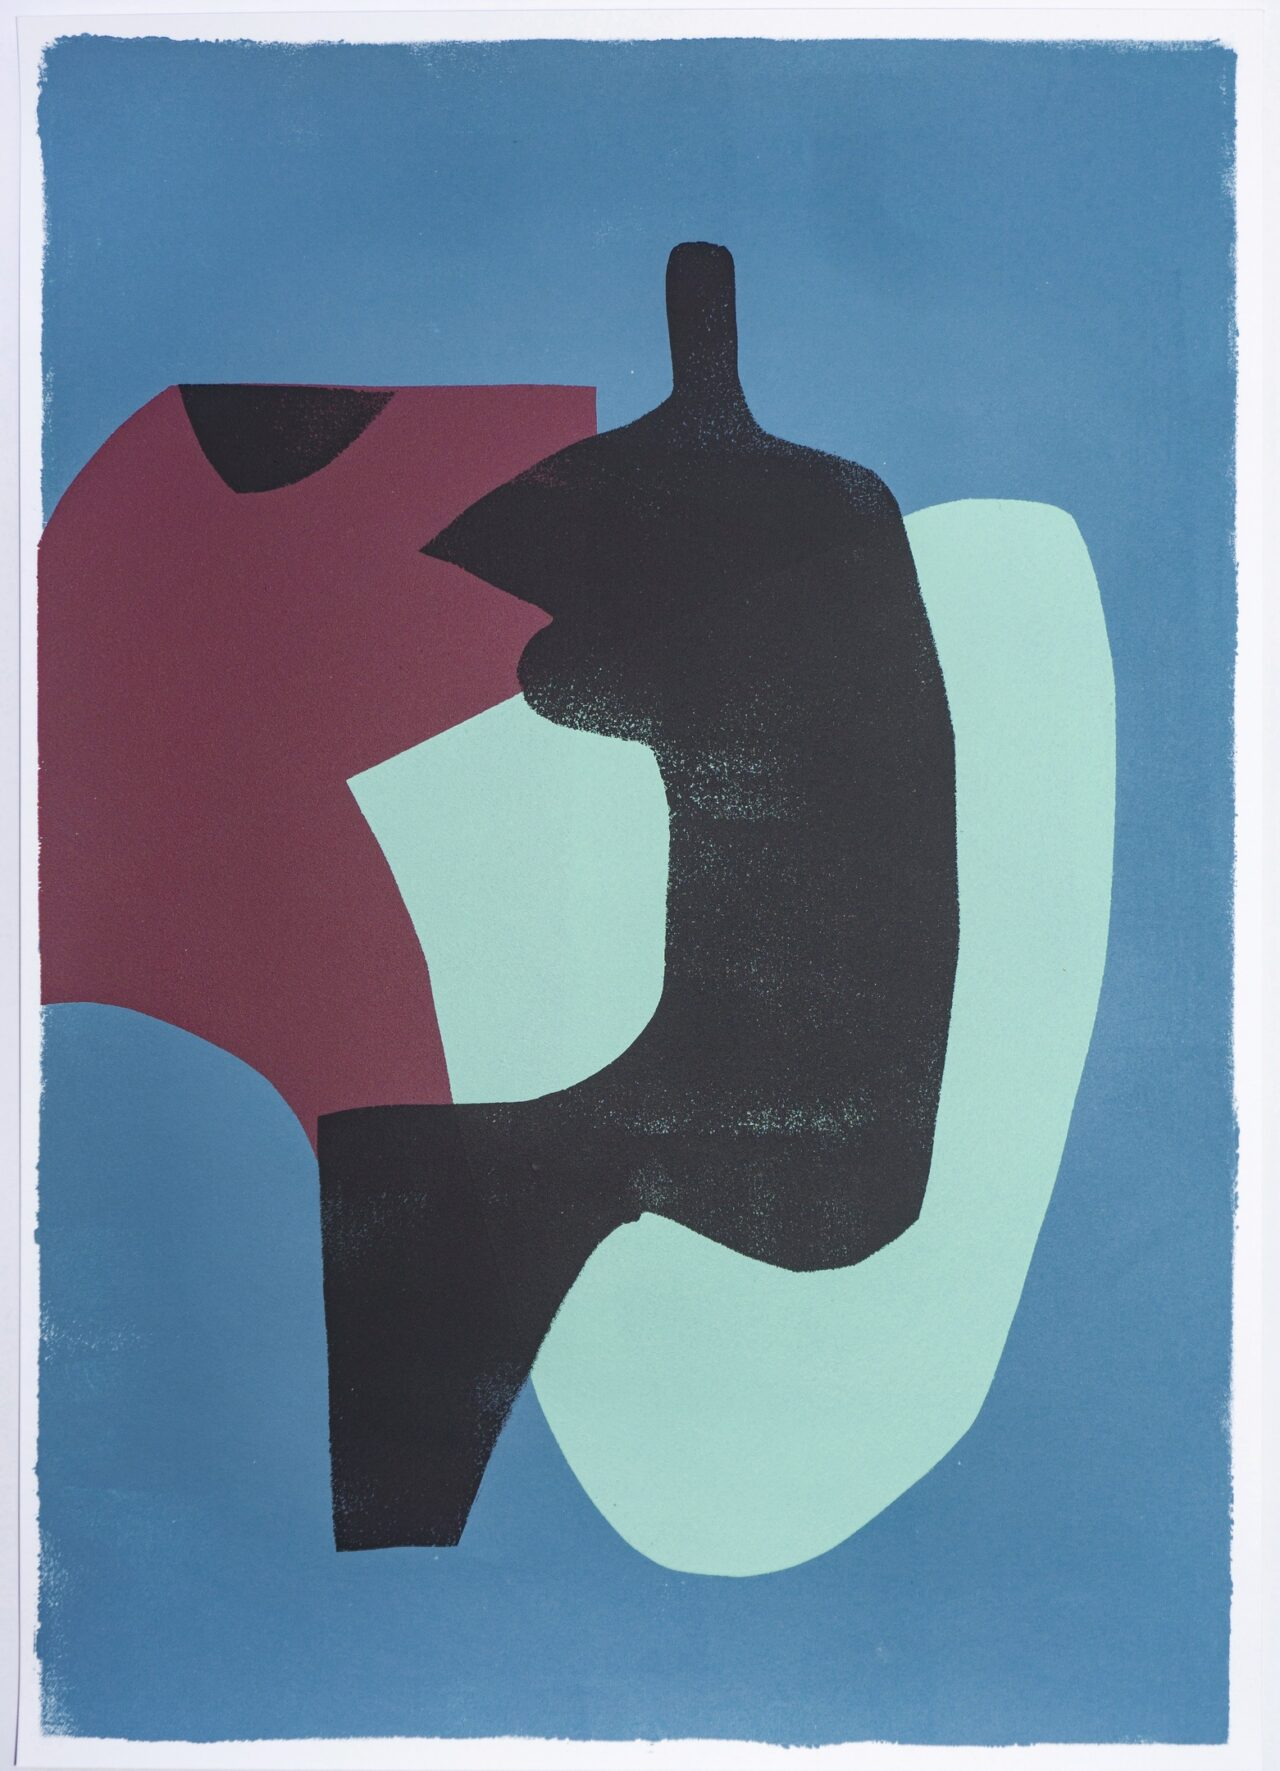 Александр Бирук. Фигура 3. 2020. Бумага, акрил, техника ручной трафаретной печати. 30 х 42 см.